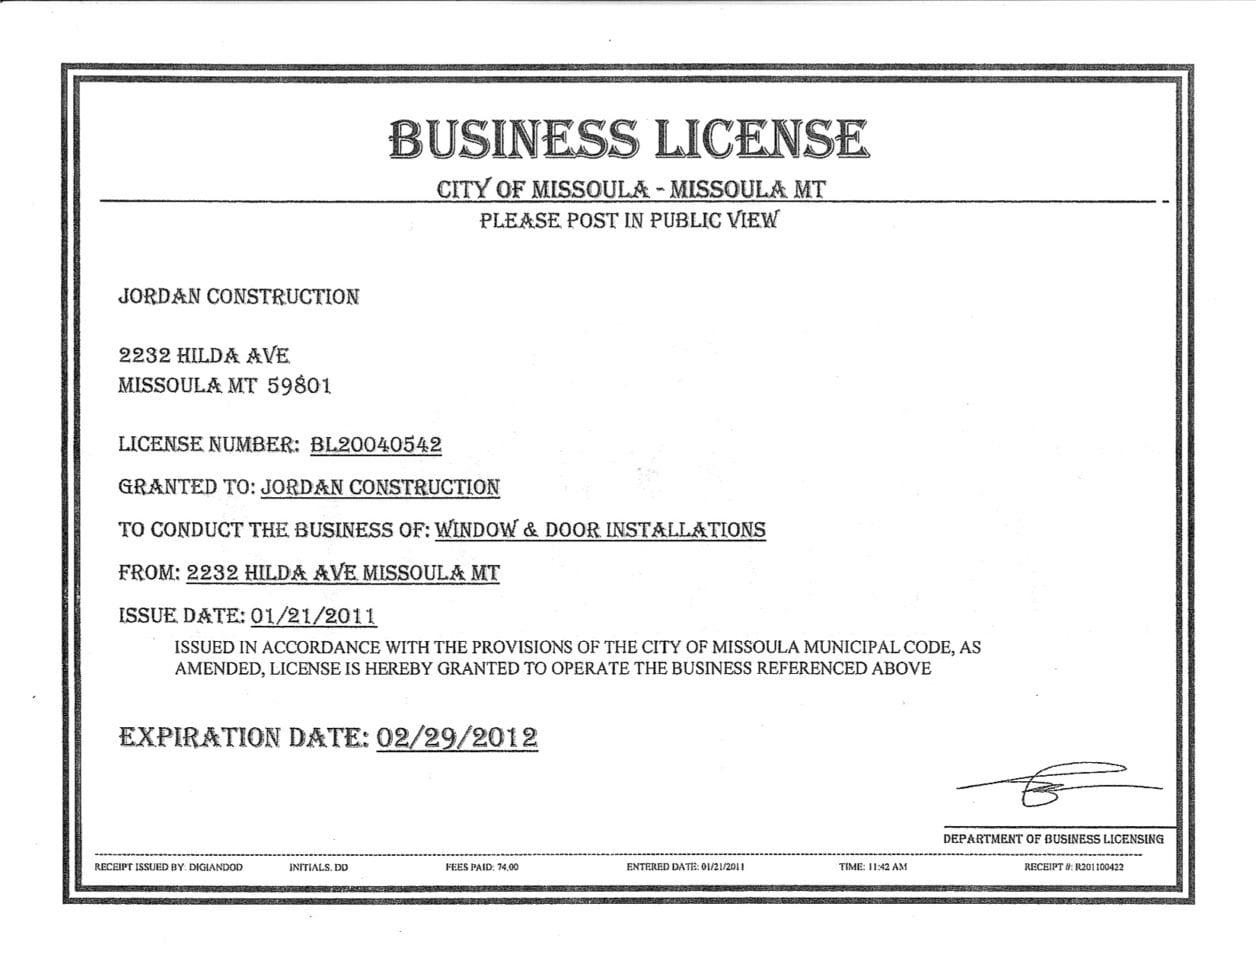 Business Registration License Spreadsheet Templates for ...